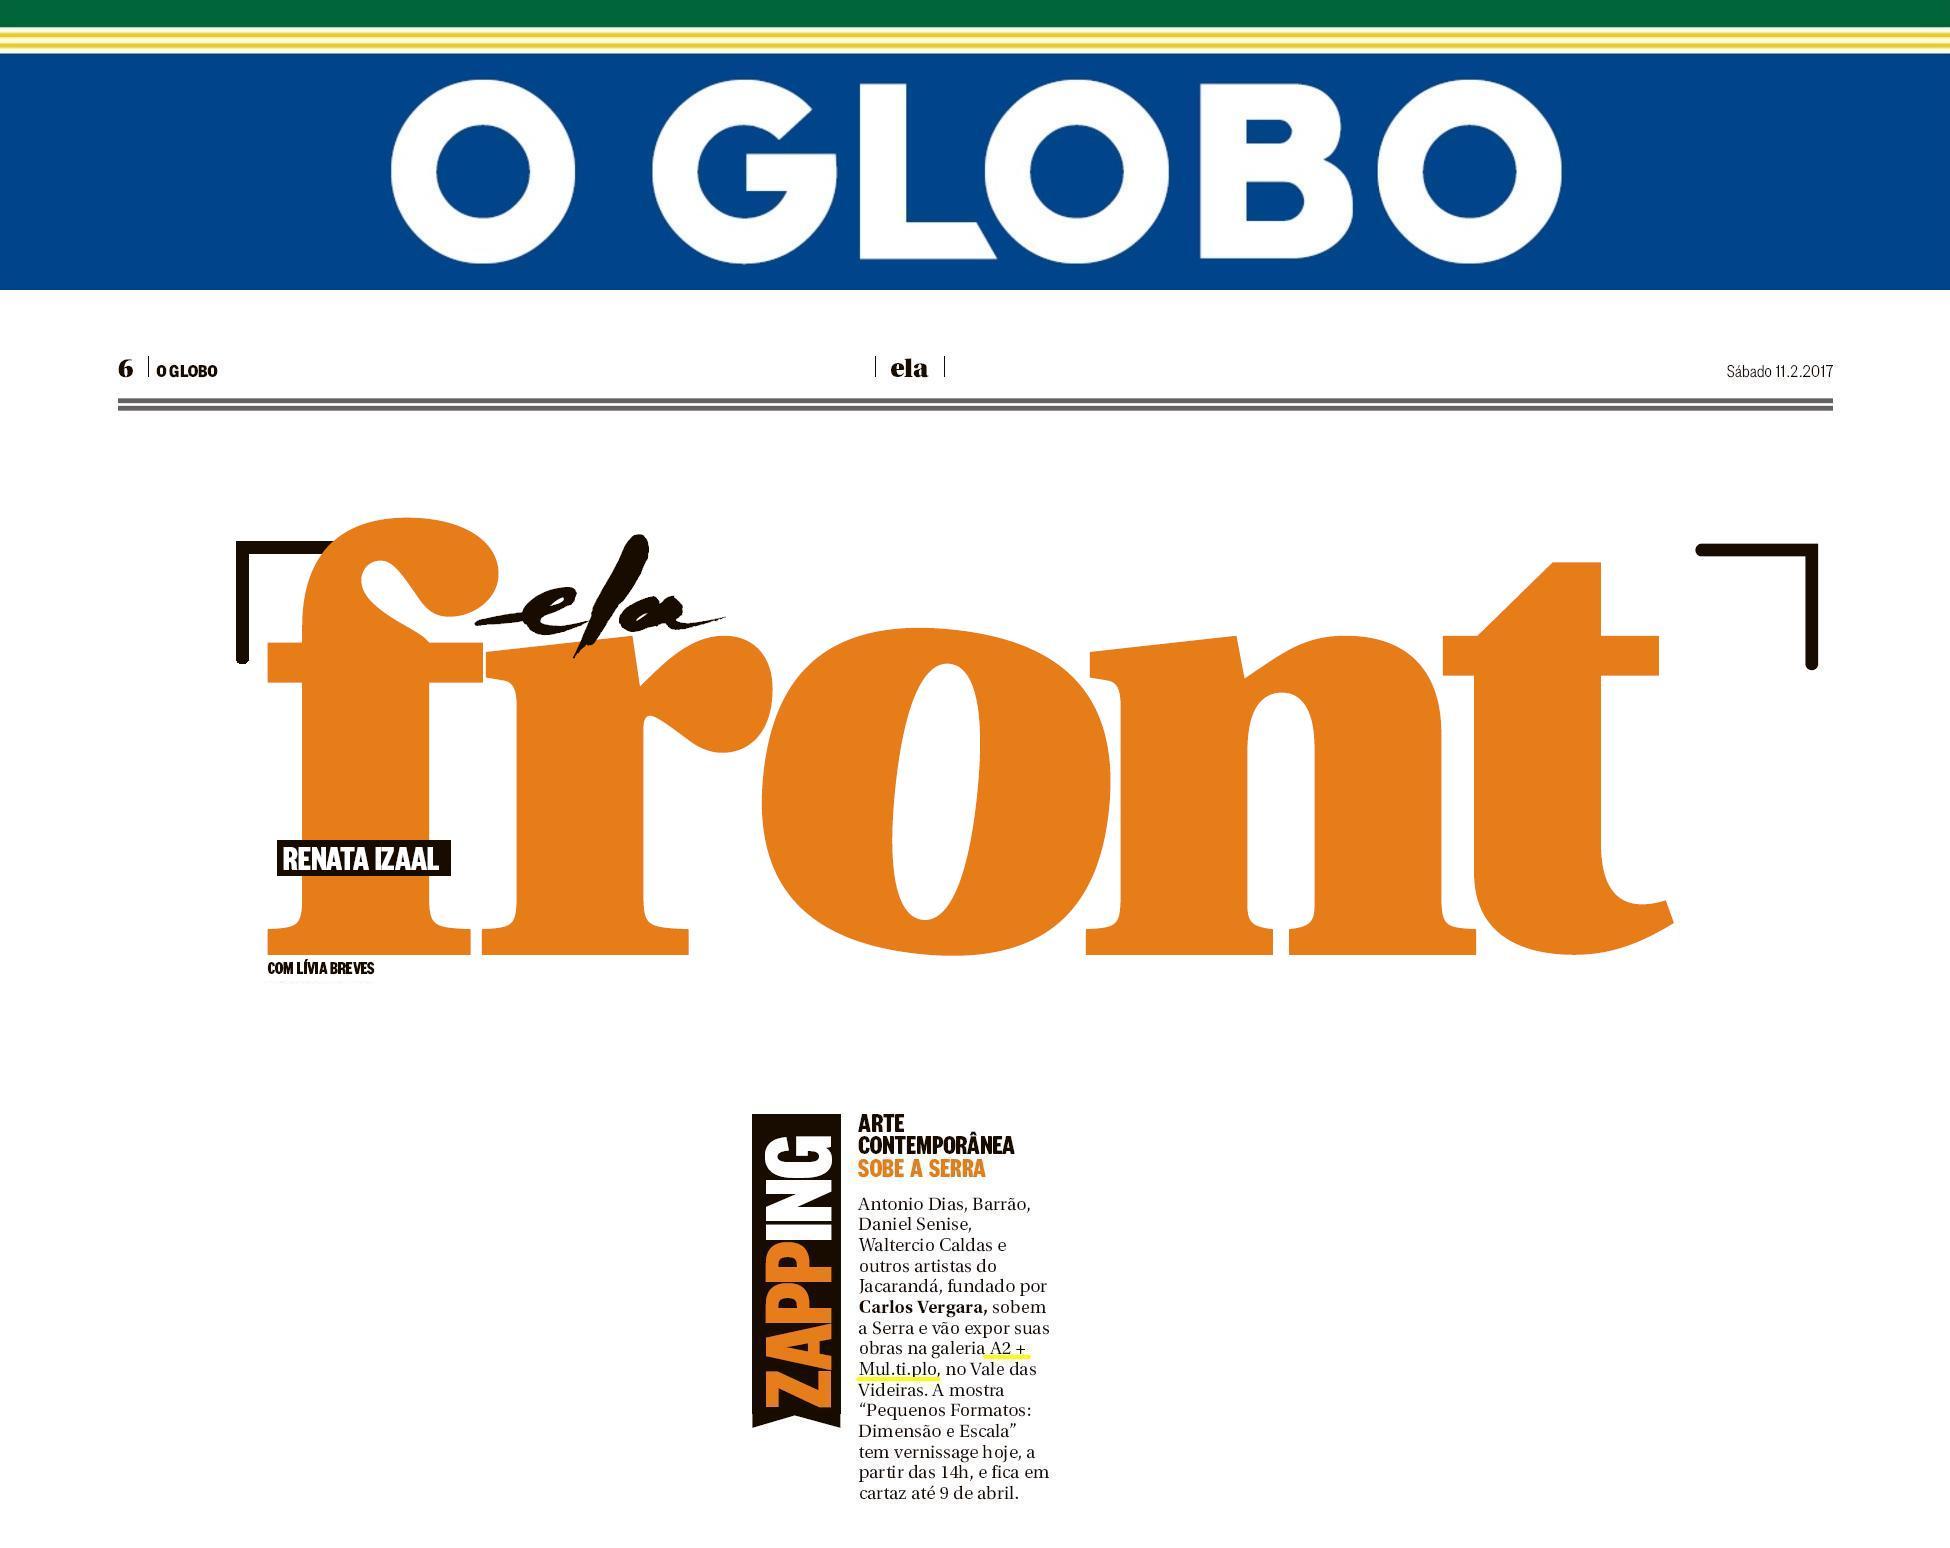 A2+MUL.TI.PLO NO ELA - FRONT 11.02.JPG